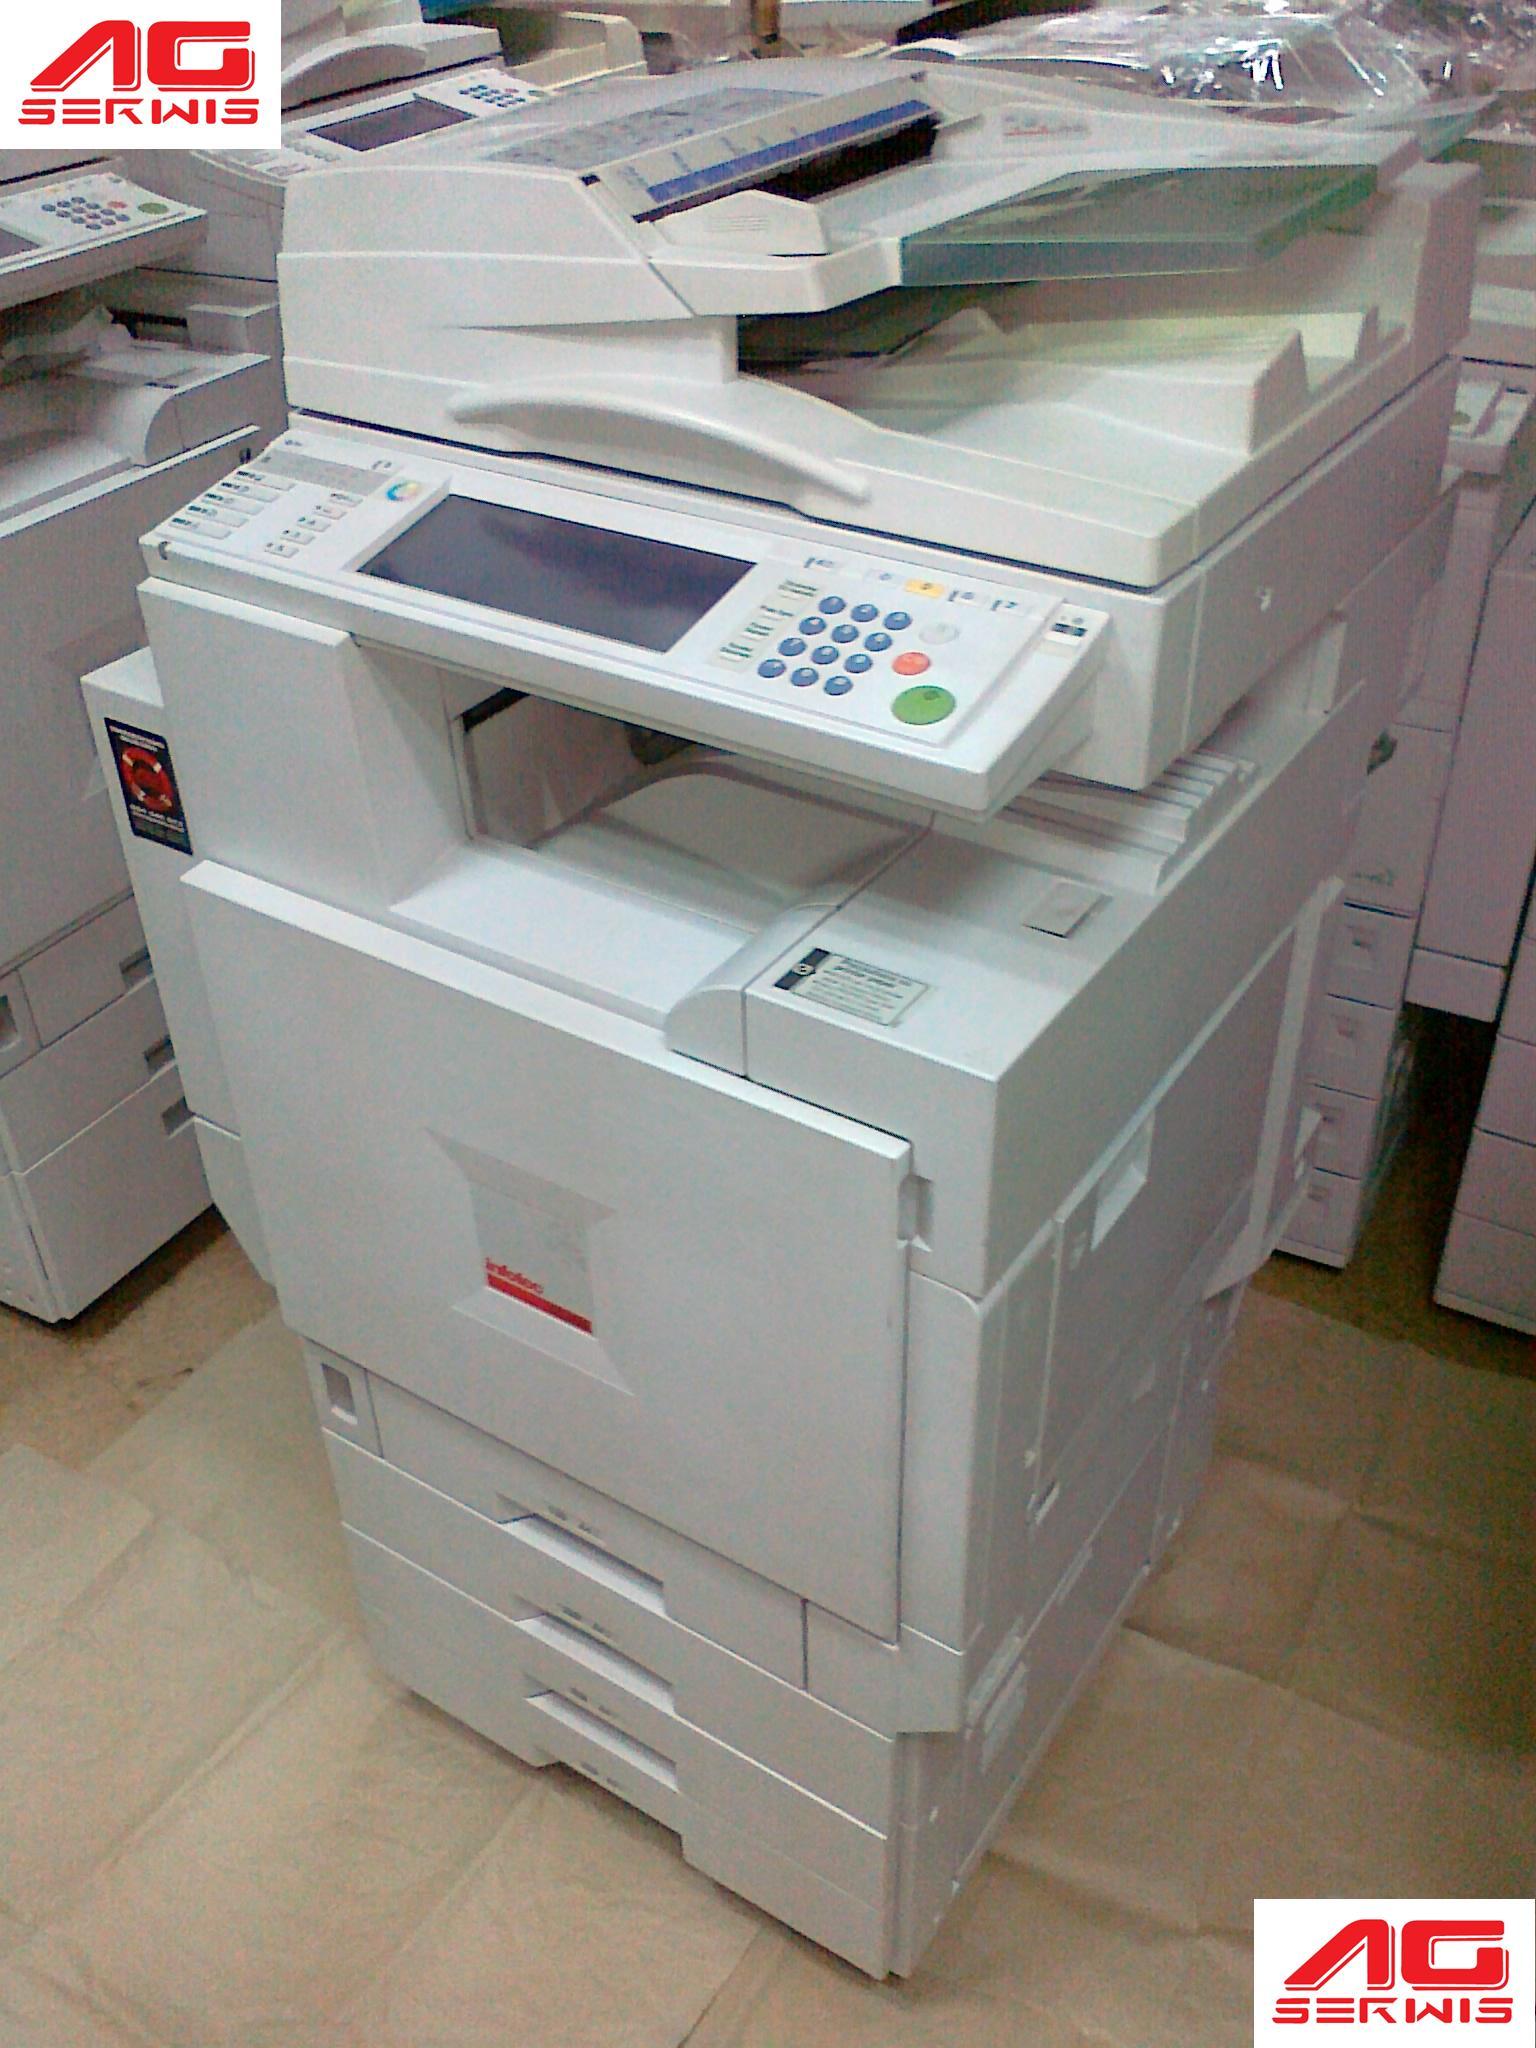 kserokopiarka drukarka kolorowa skaner faks